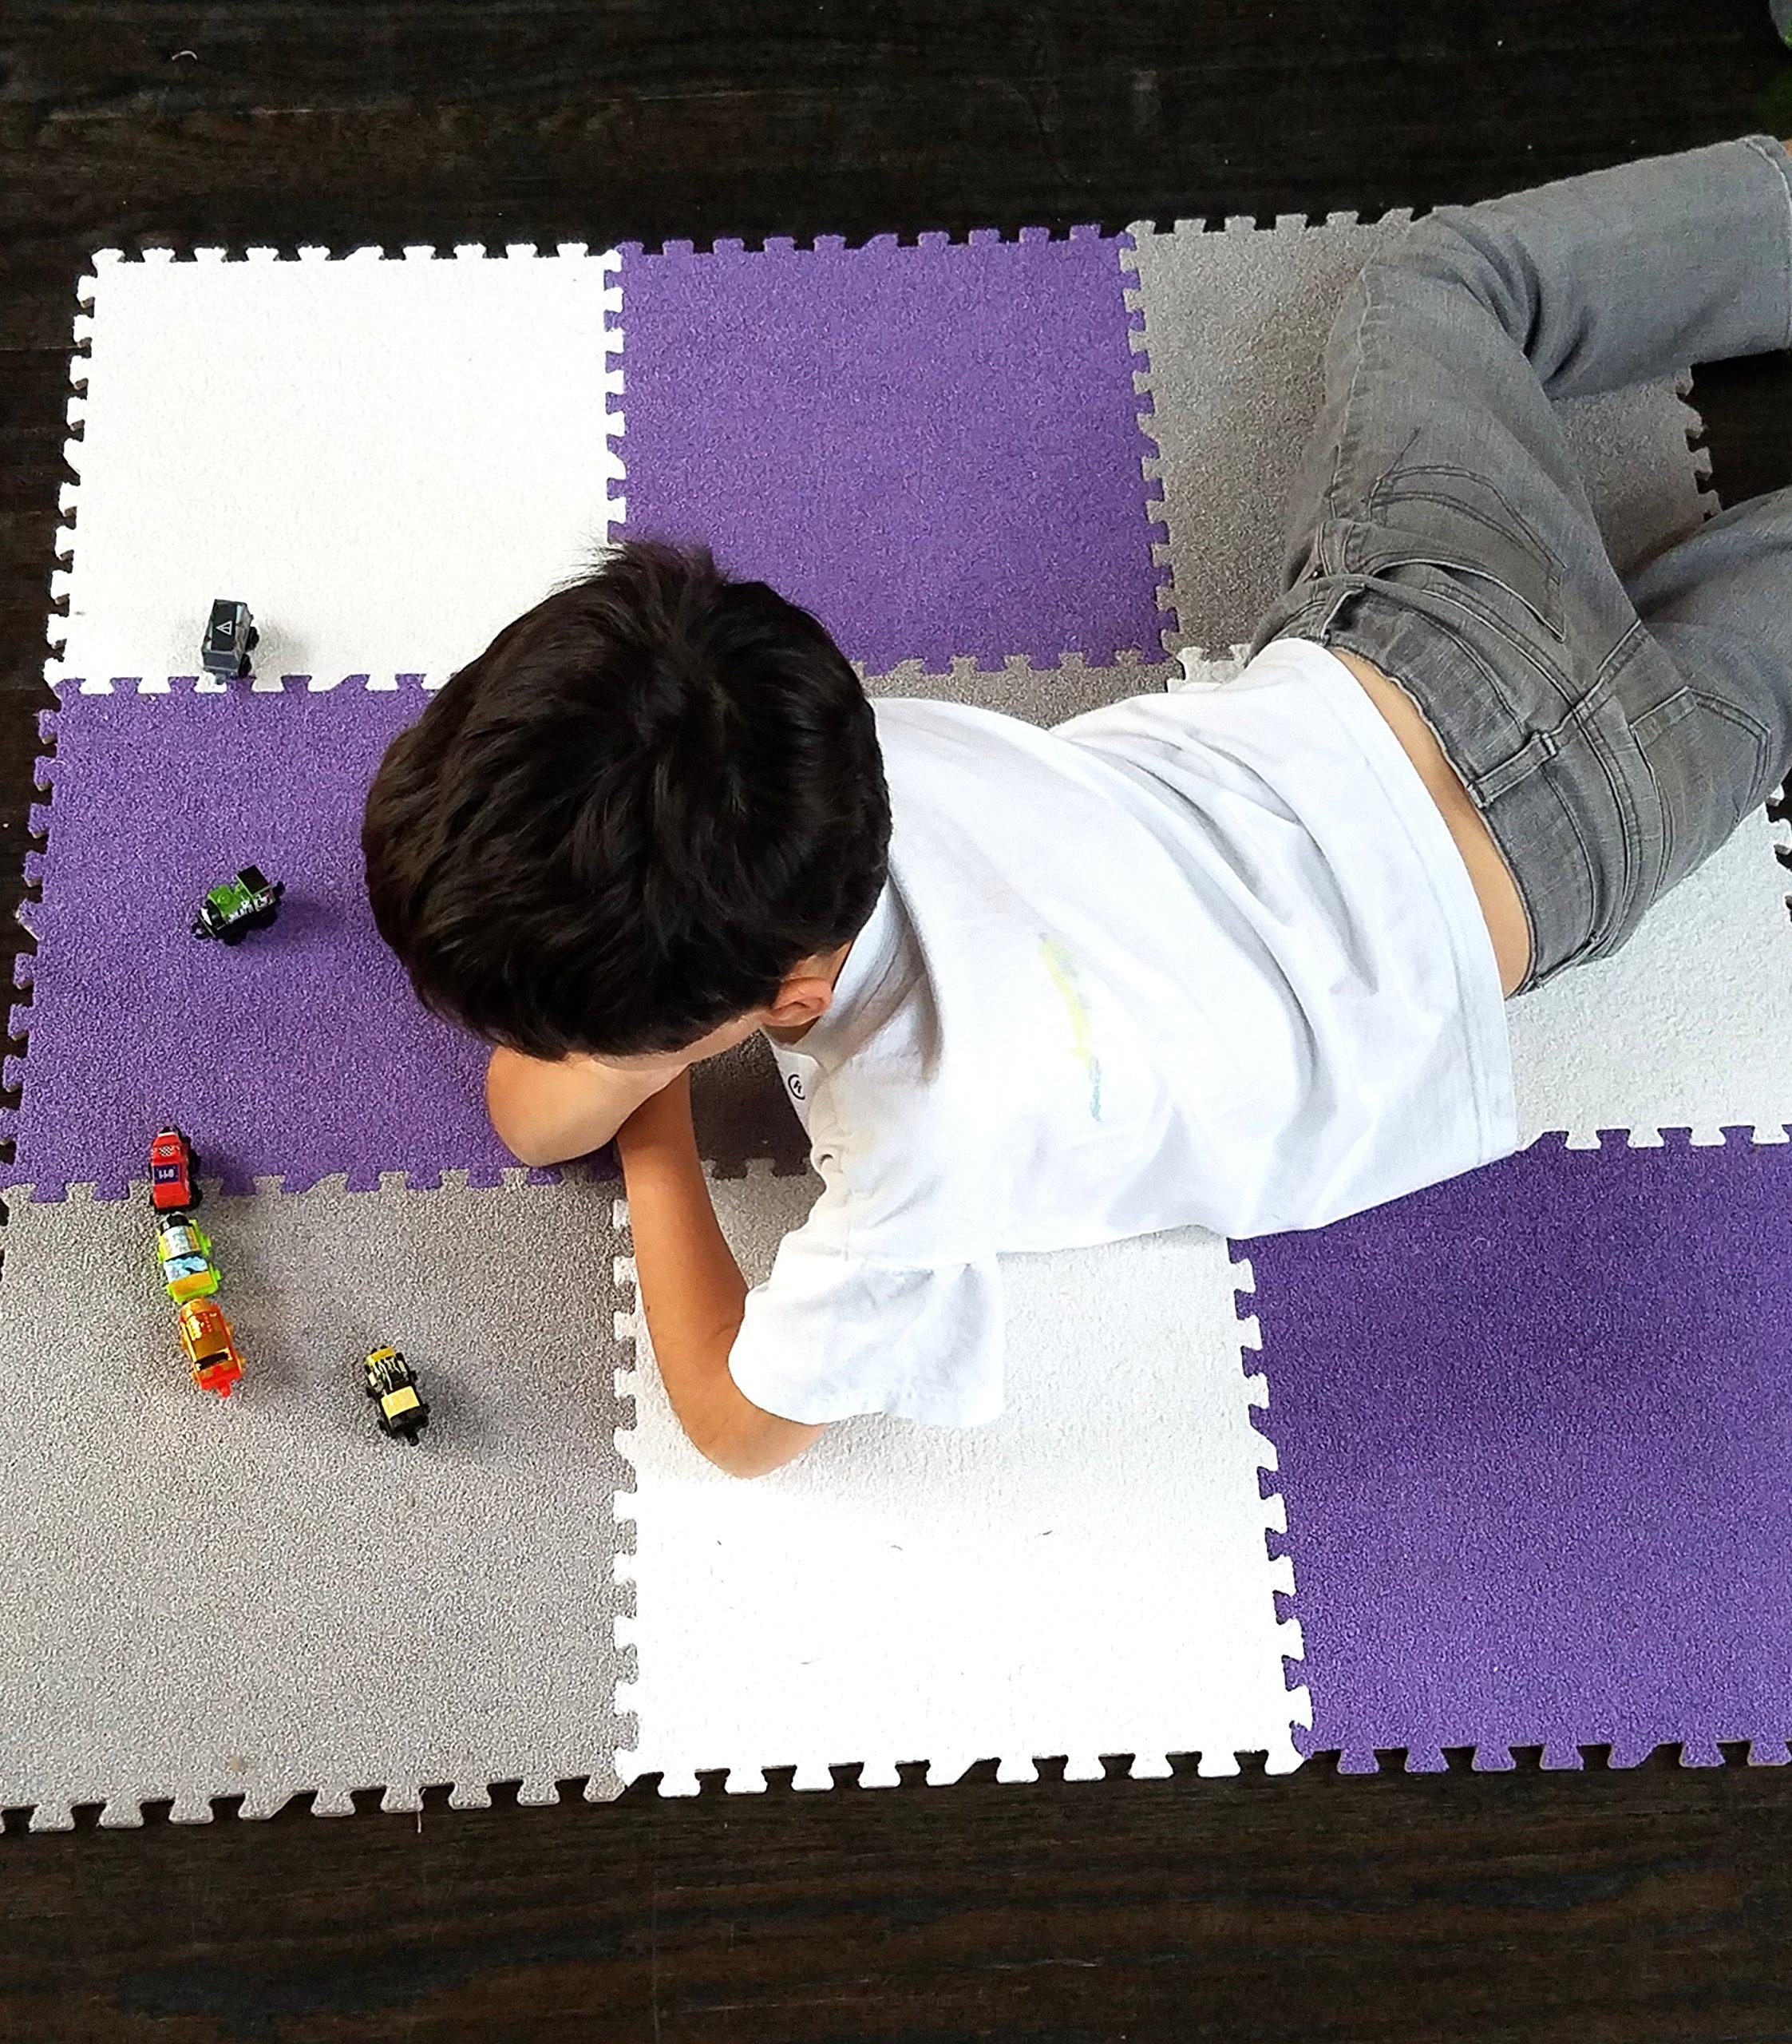 Interlocking Foam EVA Mat Carpet Flooring by Homeneeds (9 Piece, Purple, White and Grey Carpet)